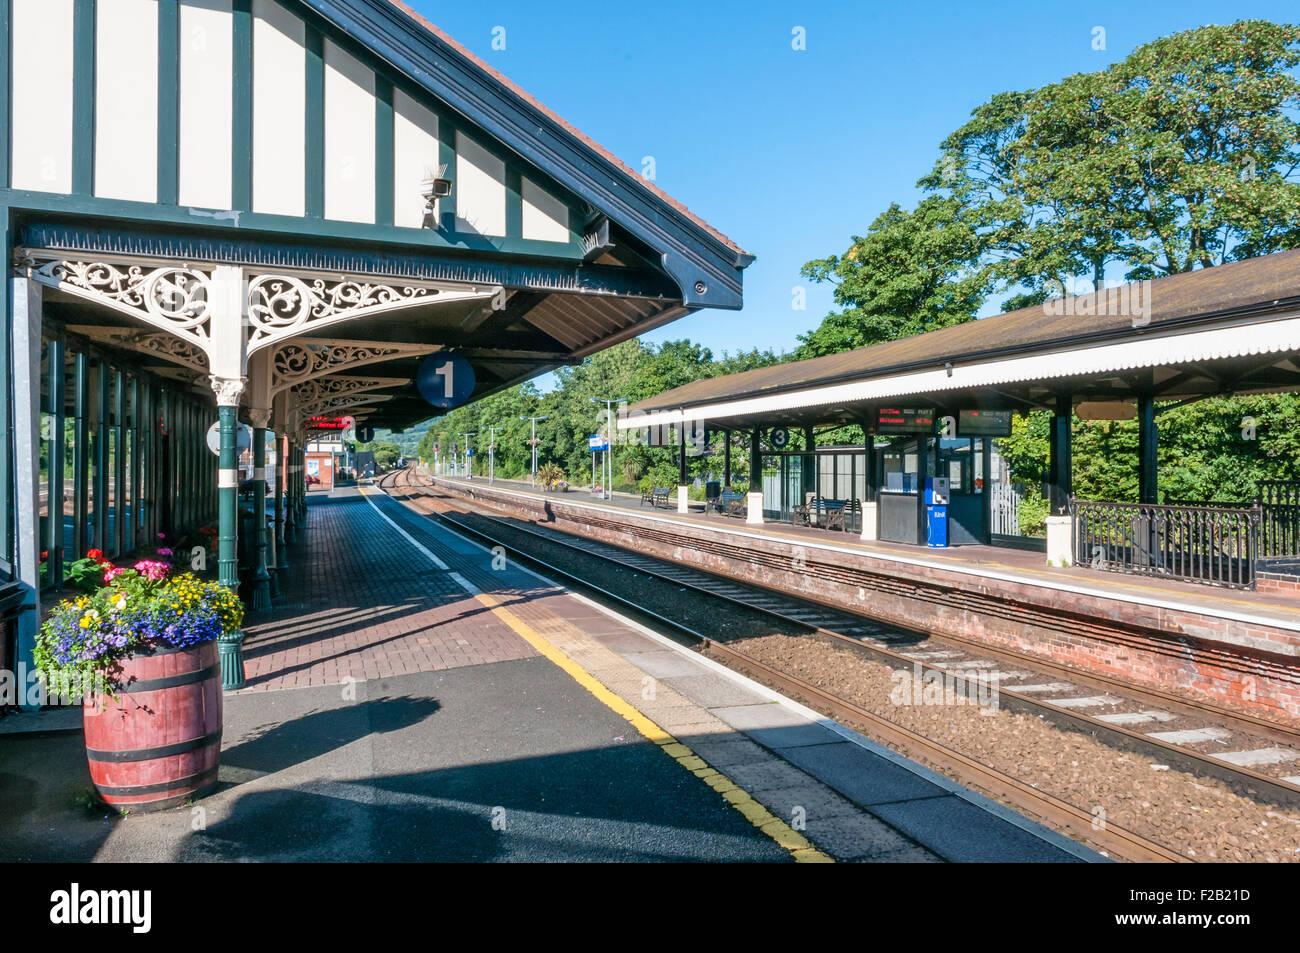 Platform at the Victorian built Carrickfergus railway station - Stock Image